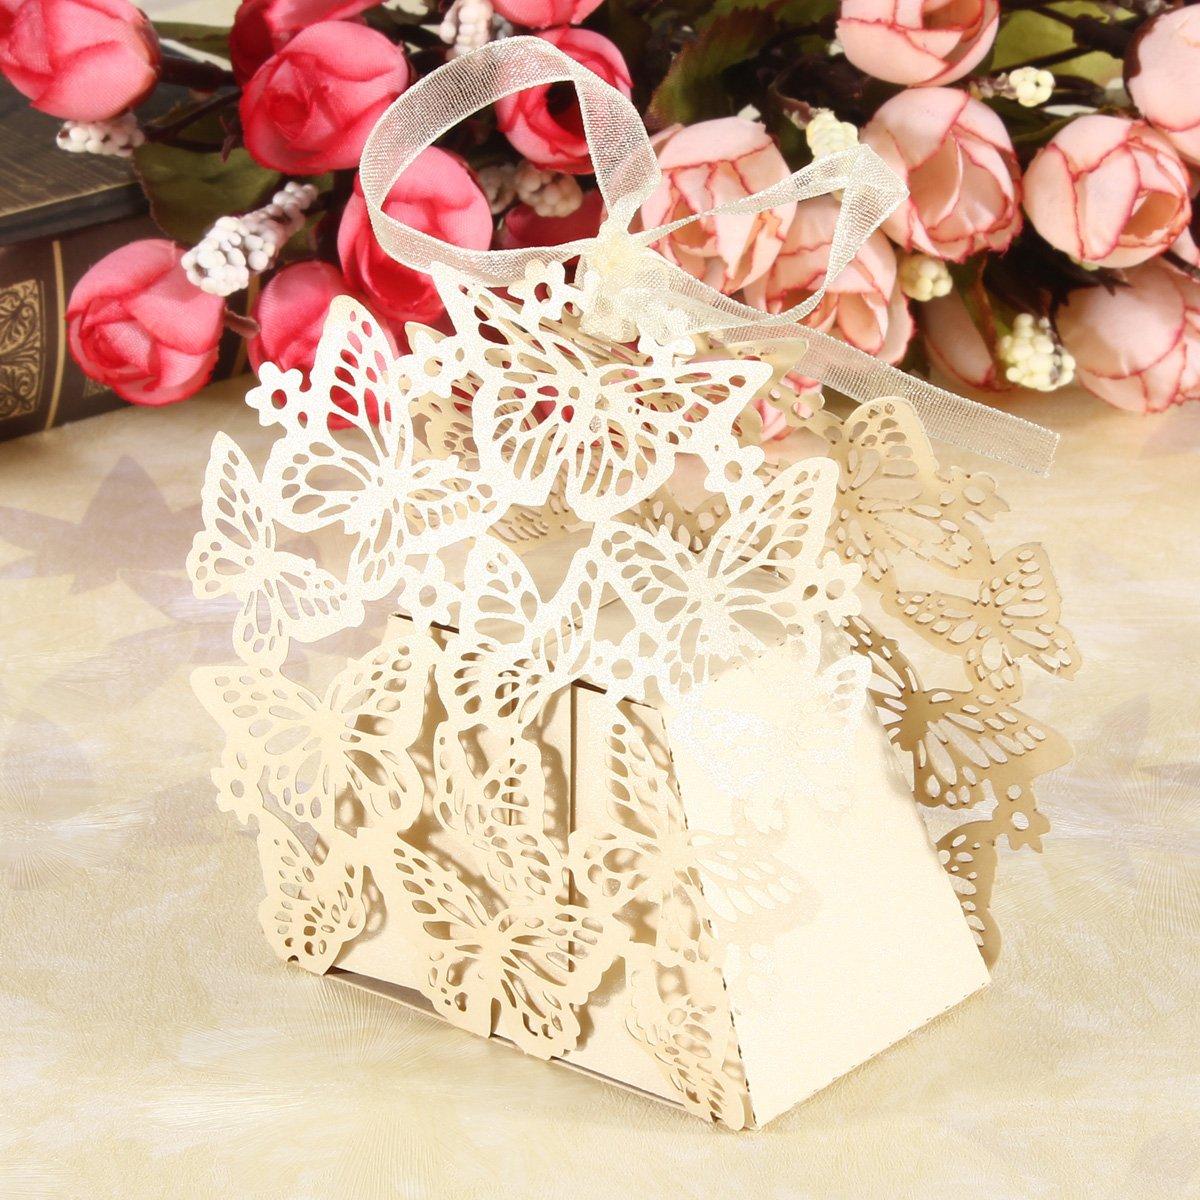 Amazon.com: Gospire 50pcs Butterfly Party Wedding Favor Box Birthday ...